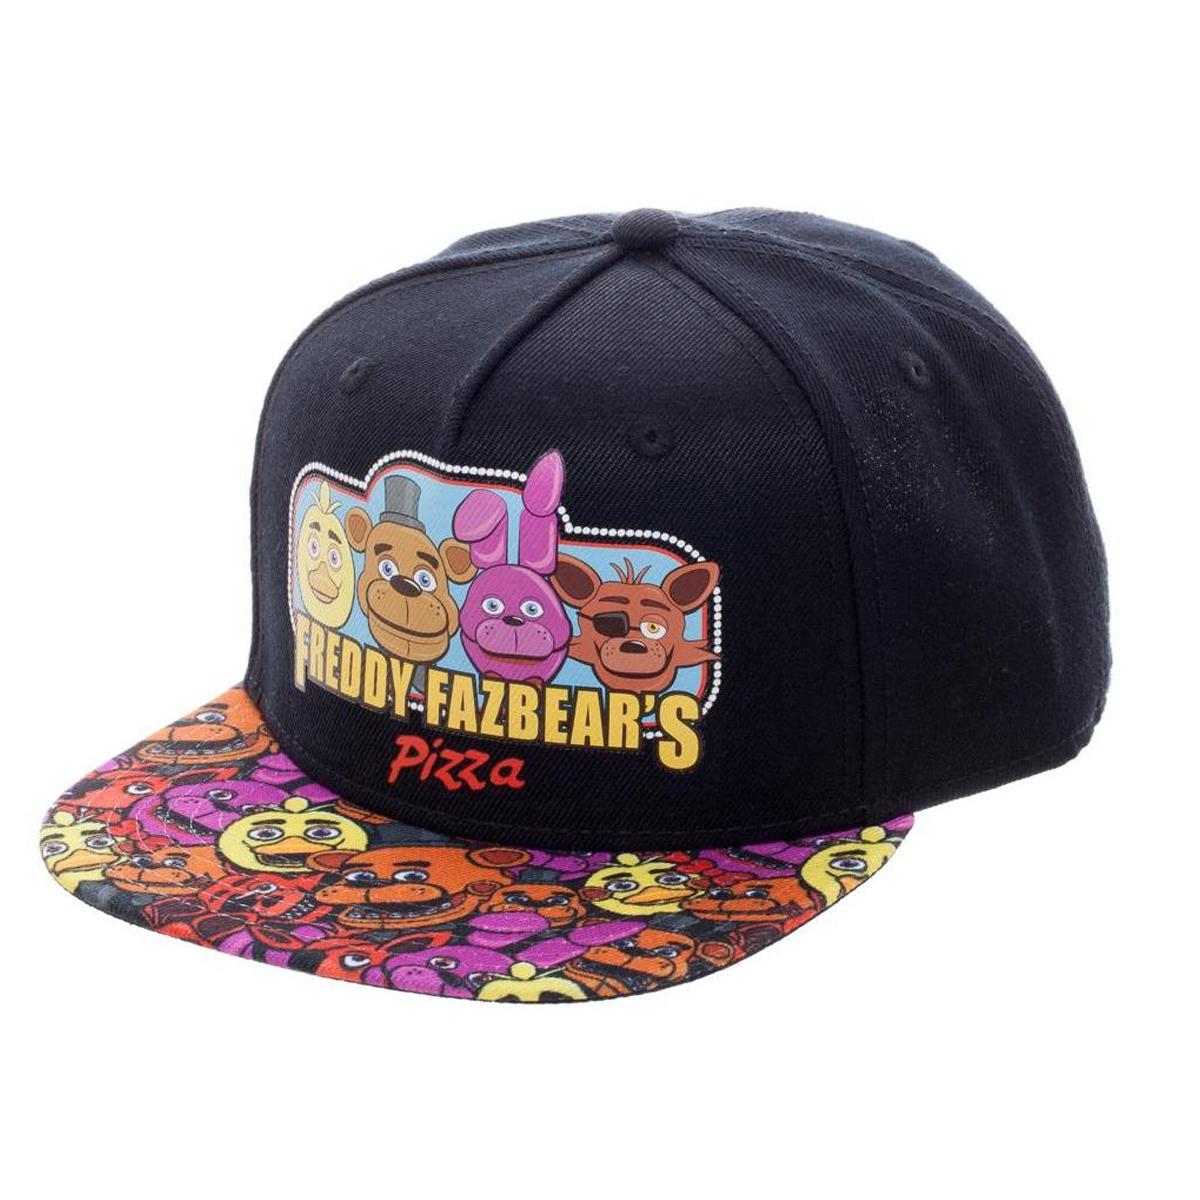 e25862280807f6 Five Nights at Freddy's Freddy Fazbear's Pizza Baseball Cap — the  television and movie store